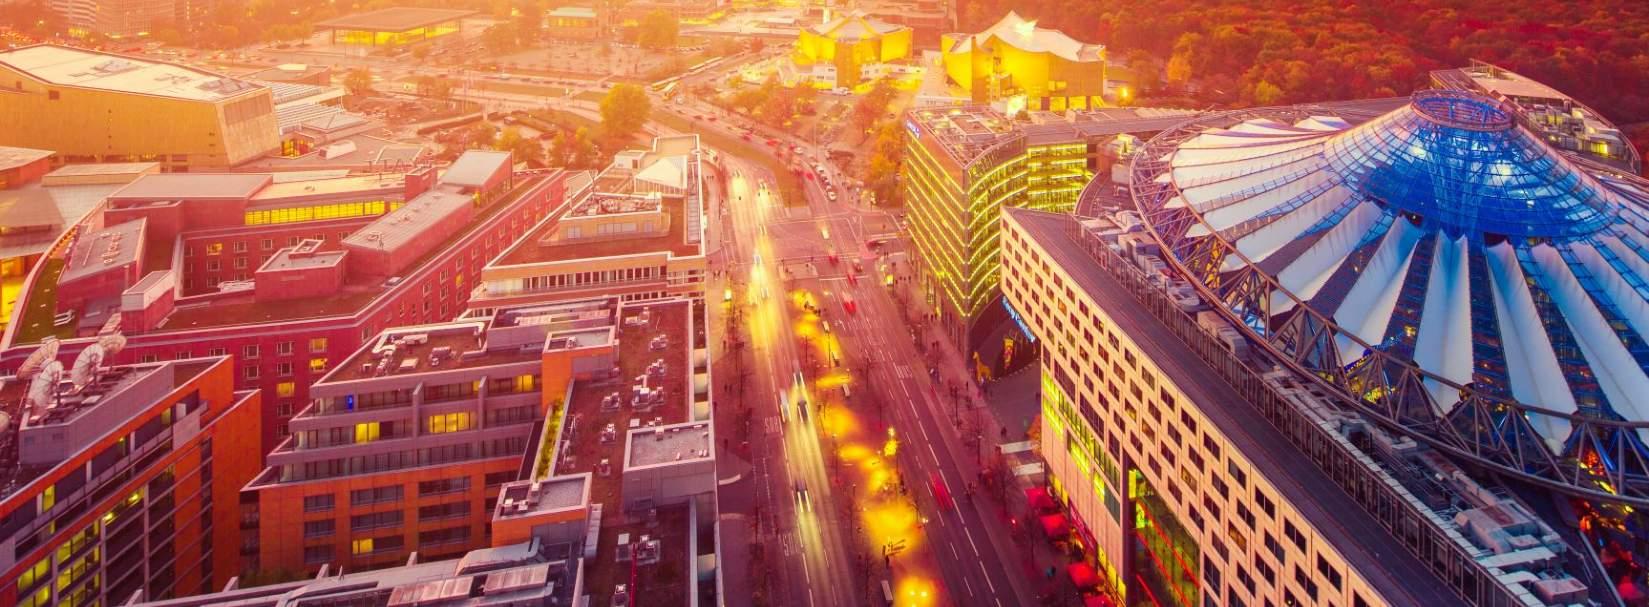 Berliner Gewerbe-Pulsschlag 2019